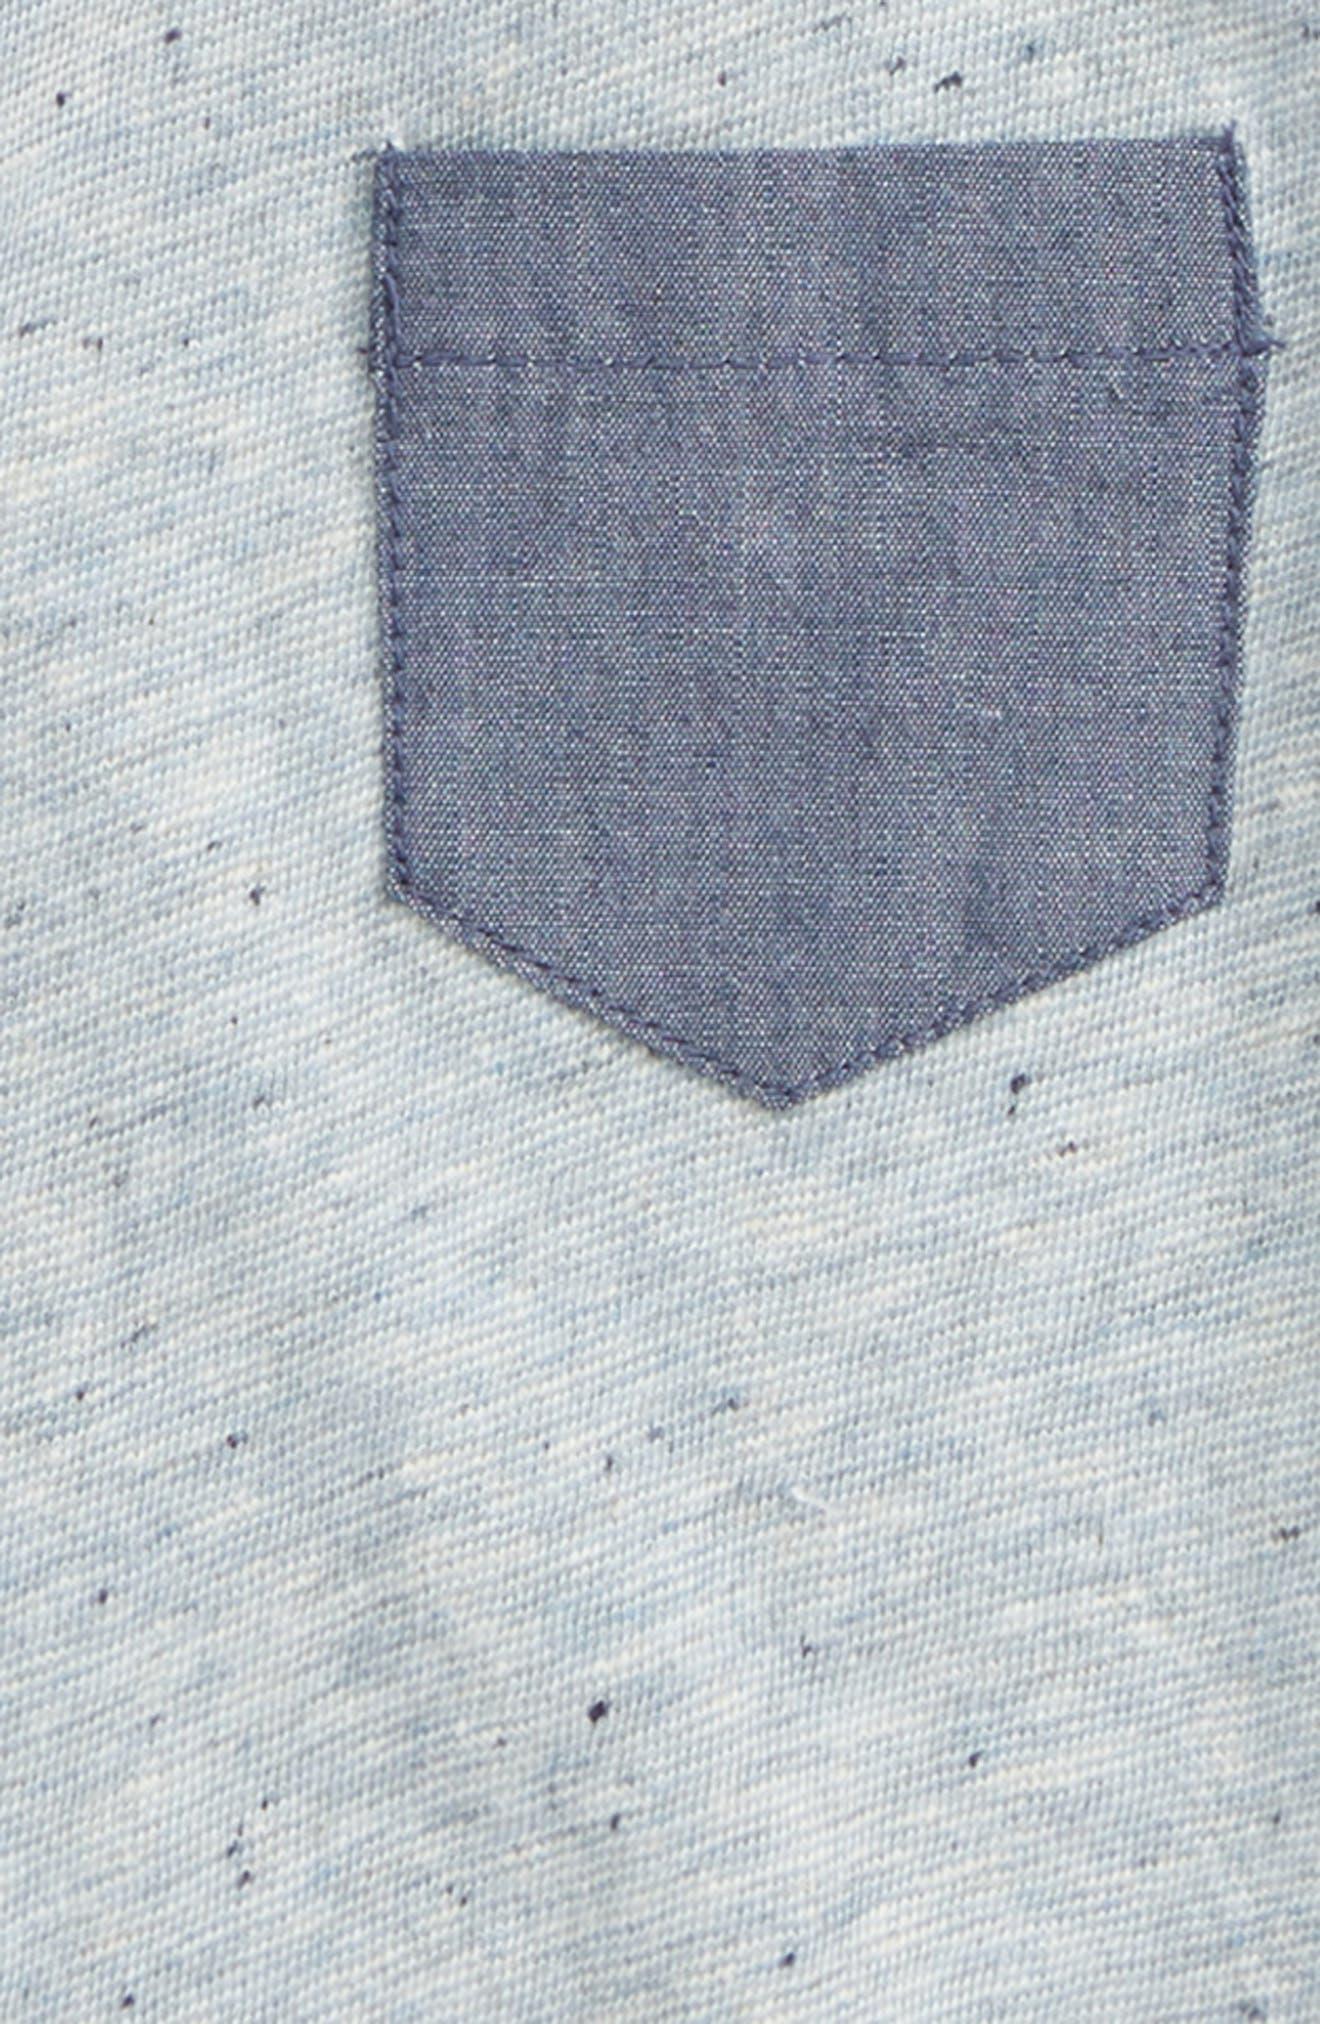 TUCKER + TATE, Pocket T-Shirt, Alternate thumbnail 2, color, BLUE DUSK